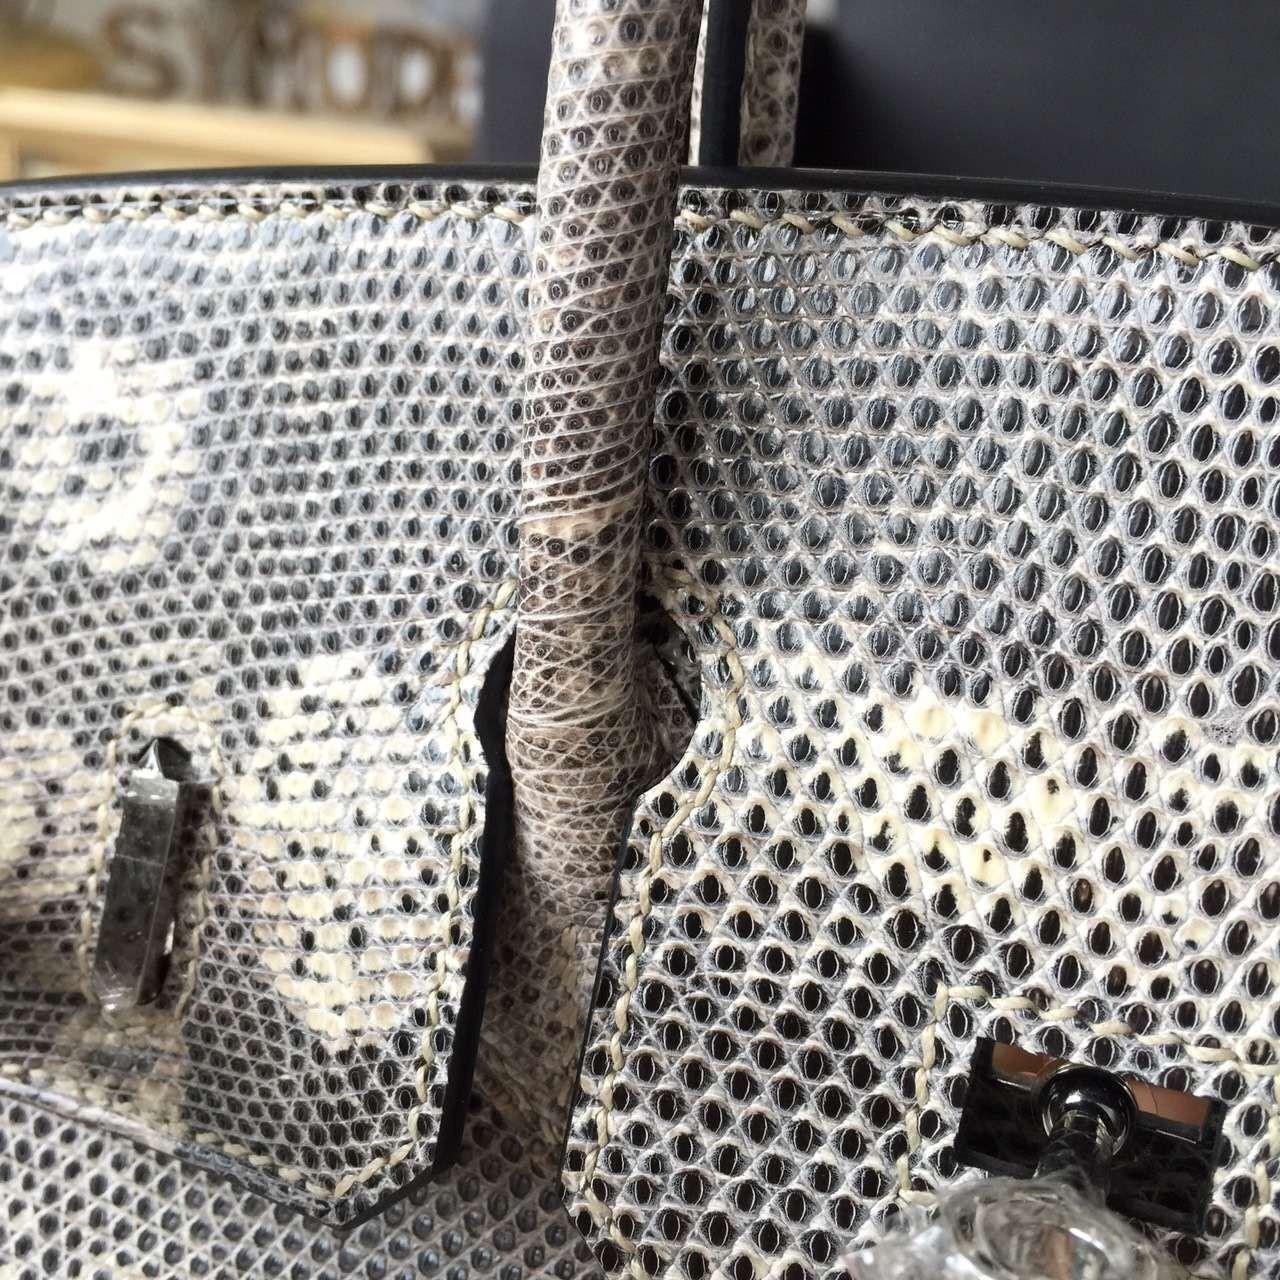 fb32bd5187 ... Hermes Birkin 25cm Natural Lizard Skin Original Leather Bag  Handstitched Palladium Hardware